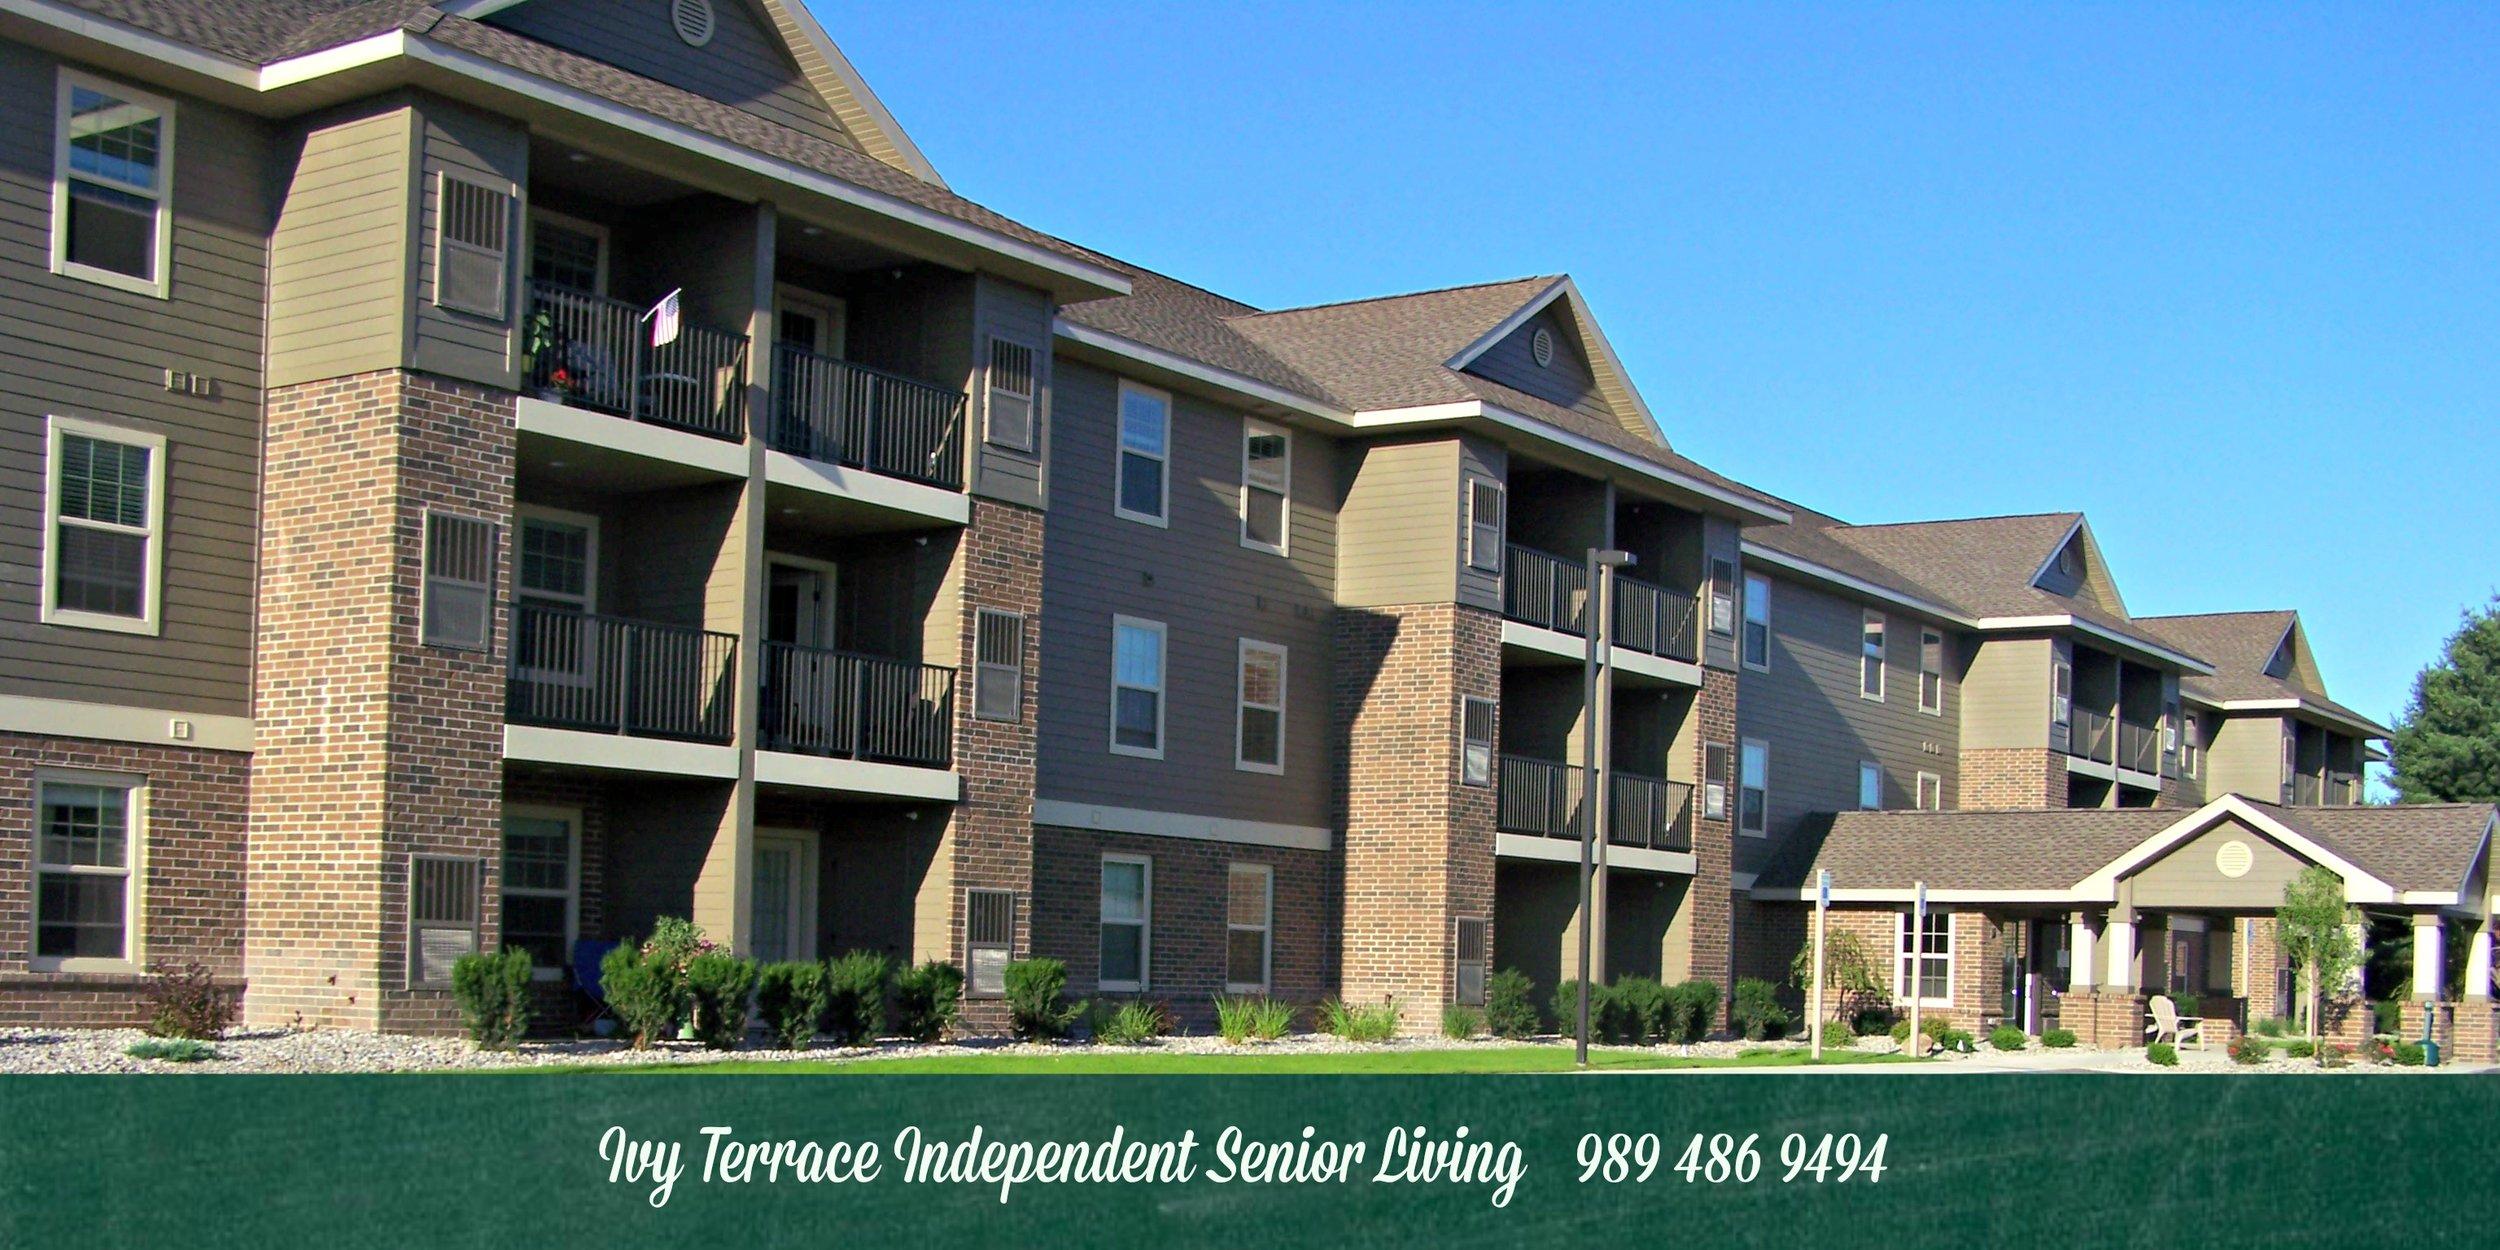 Ivy Terrace Independent Senior Residences Midland MI